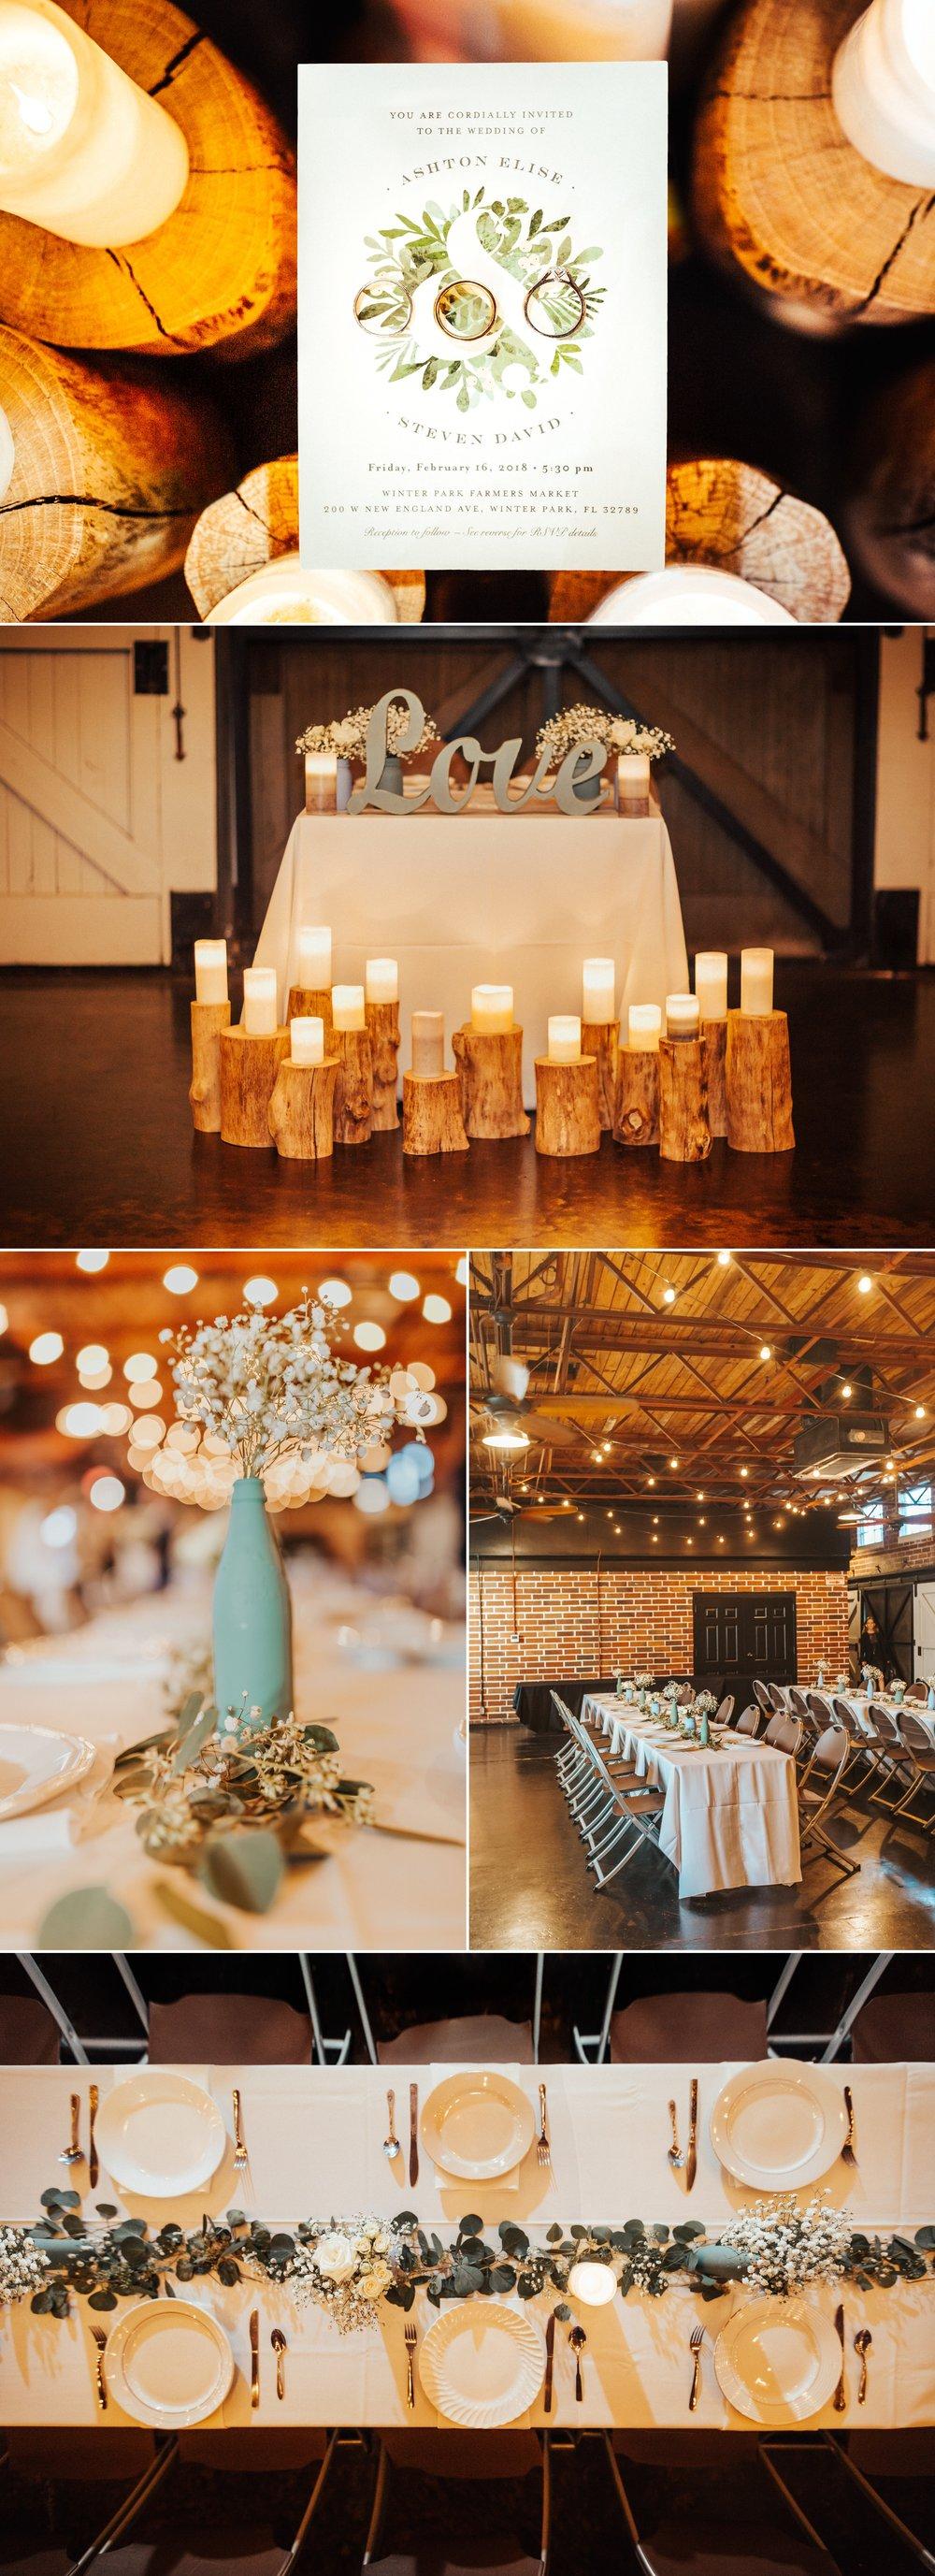 Rustic Chic Elegant Wedding Reception by Over the Moon Orlando